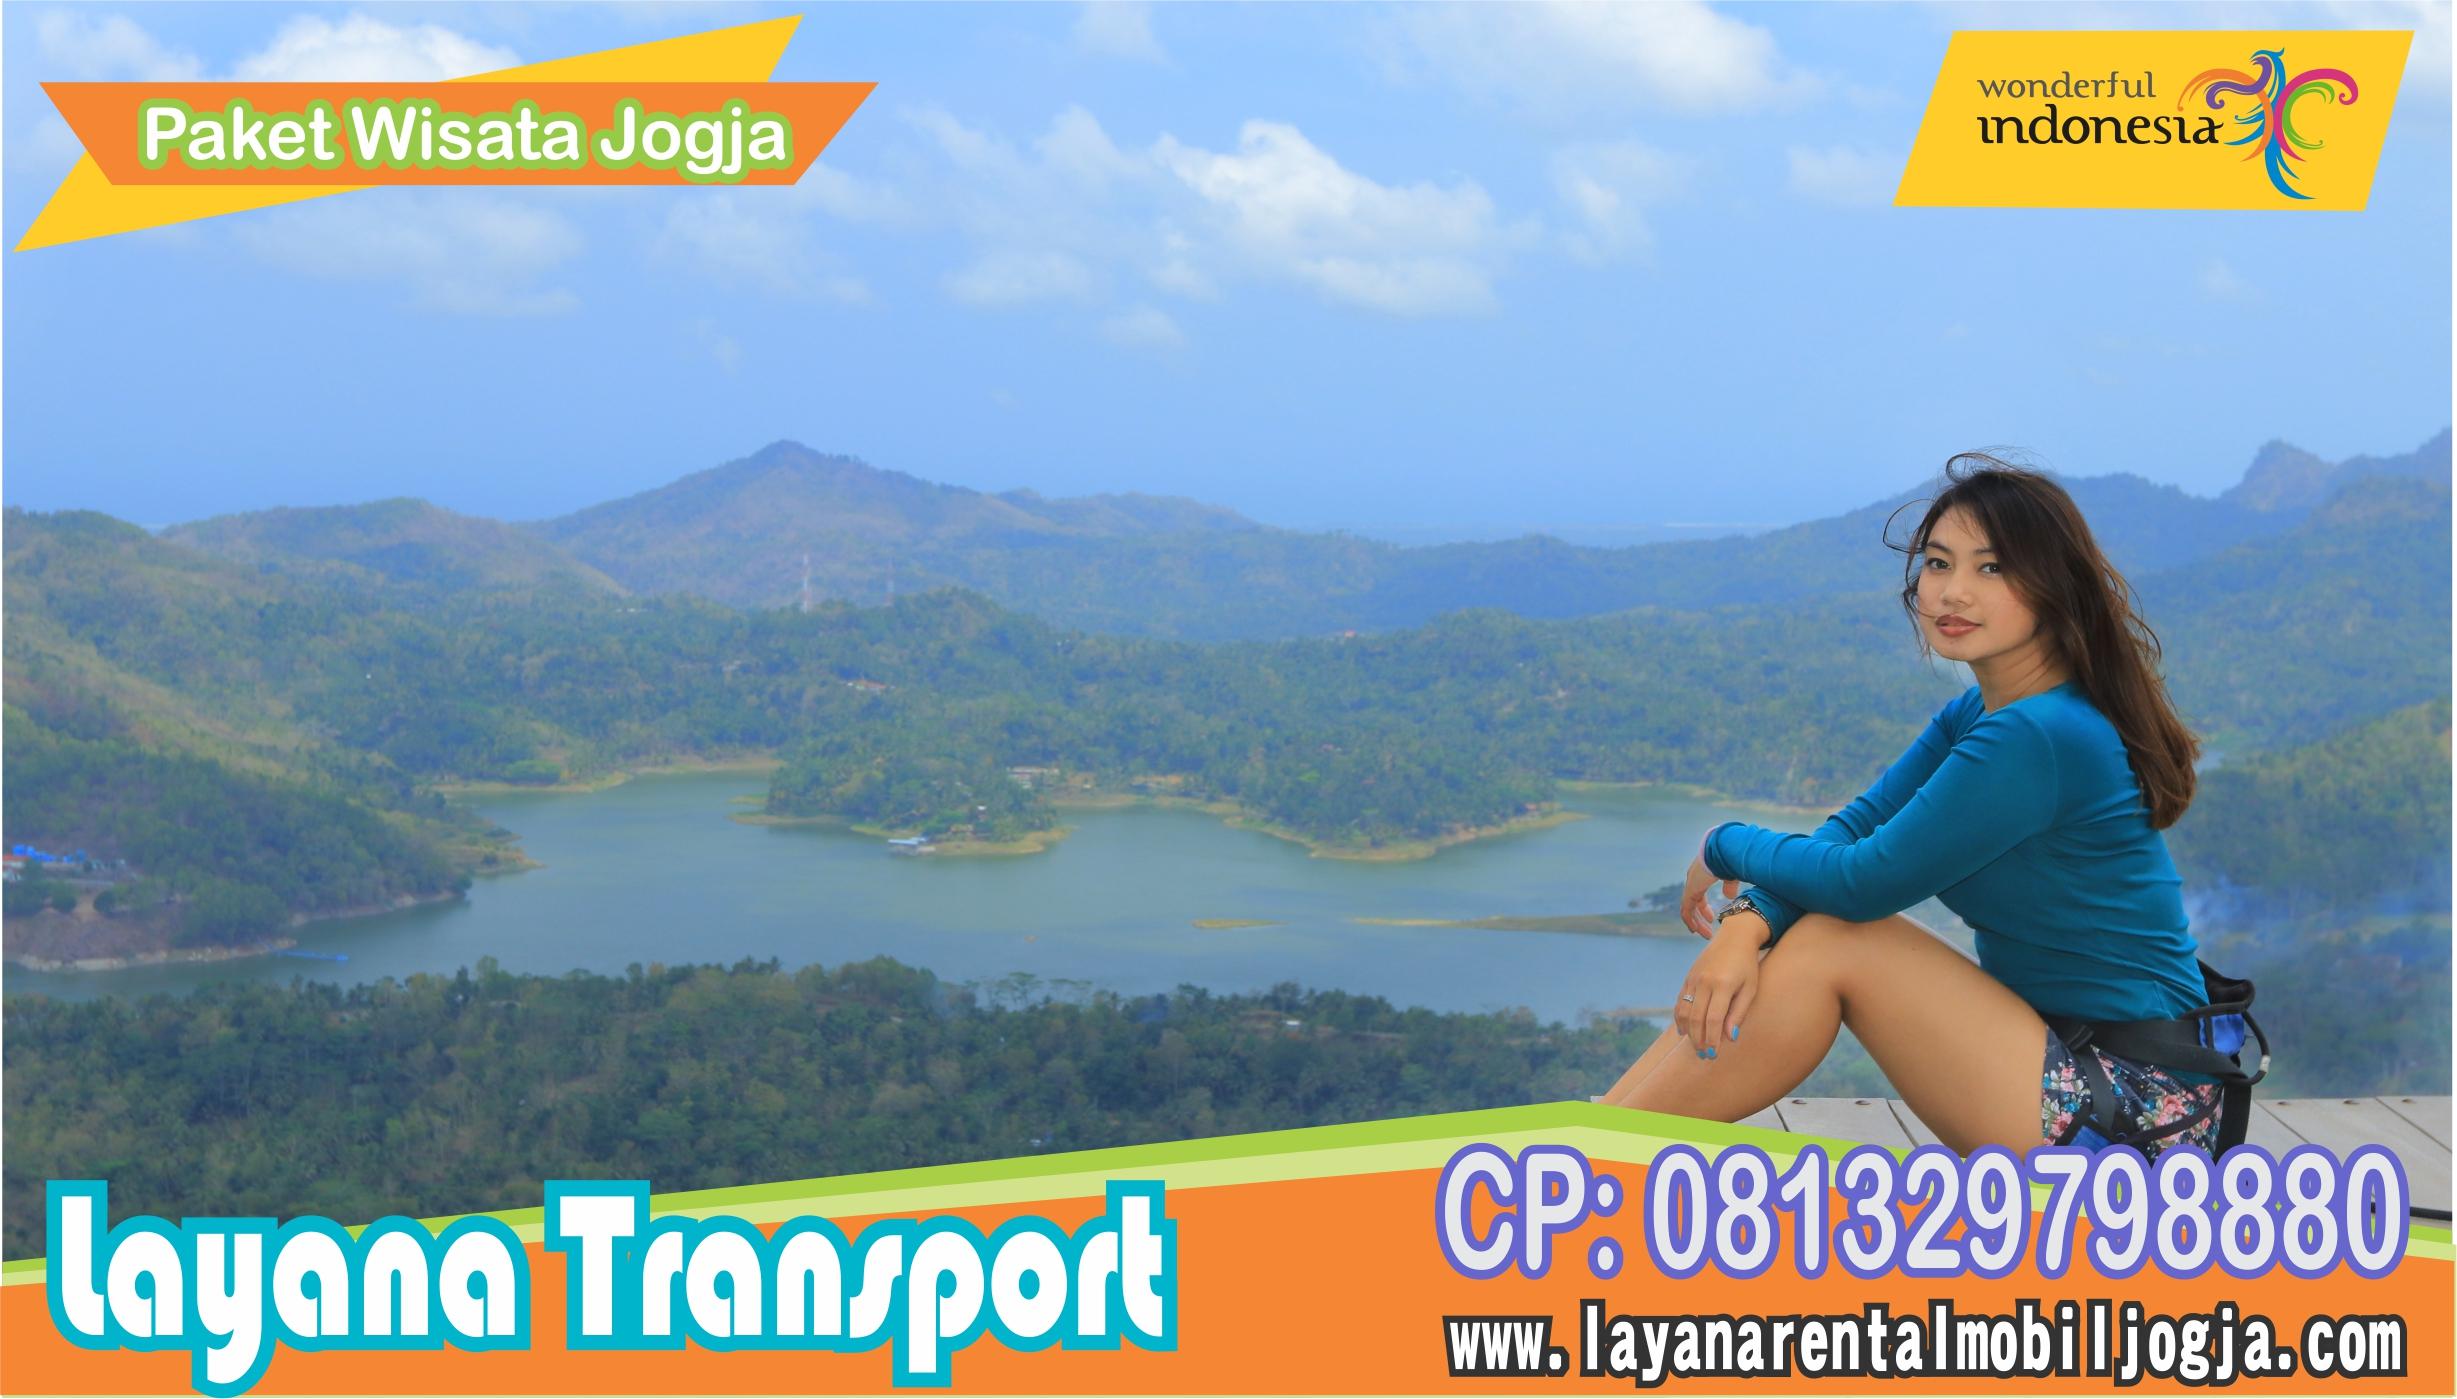 Paket Wisata Jogja Murah ~ Tour Liburan Yogyakarta | Layana Transport - Sewa menyewa jadi lebih mudah di Spotsewa